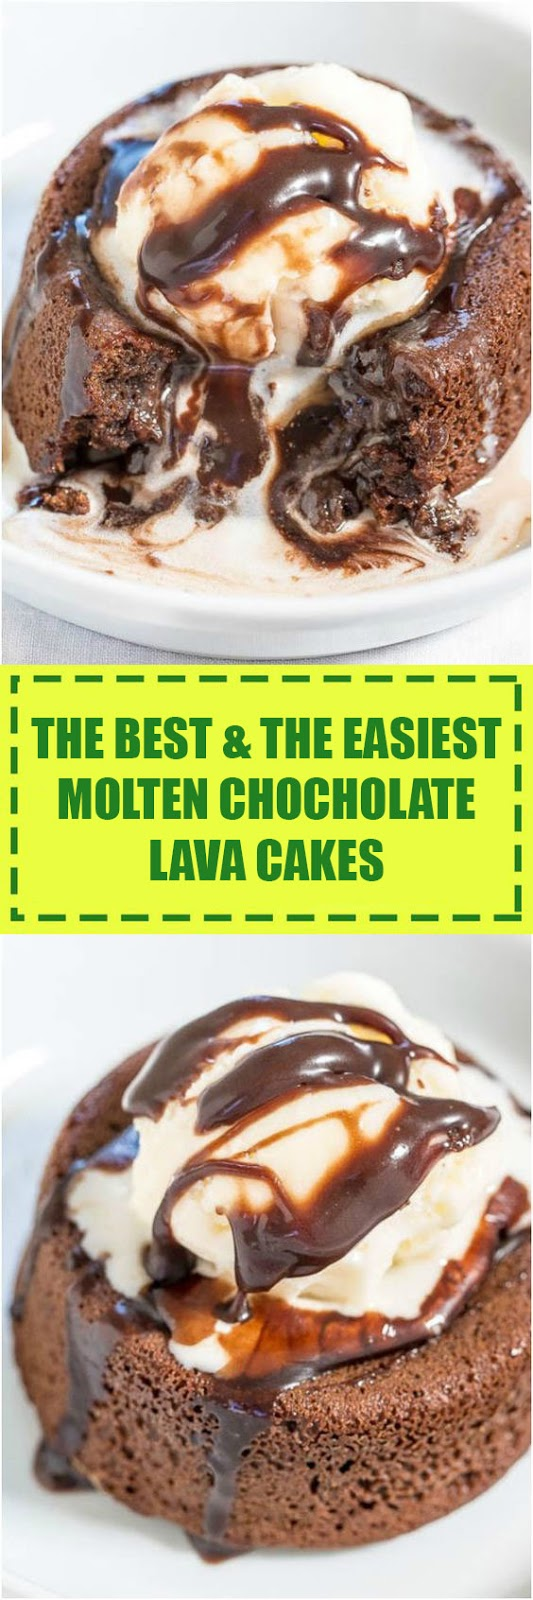 Easy Molten Chocolate Lava Cakes